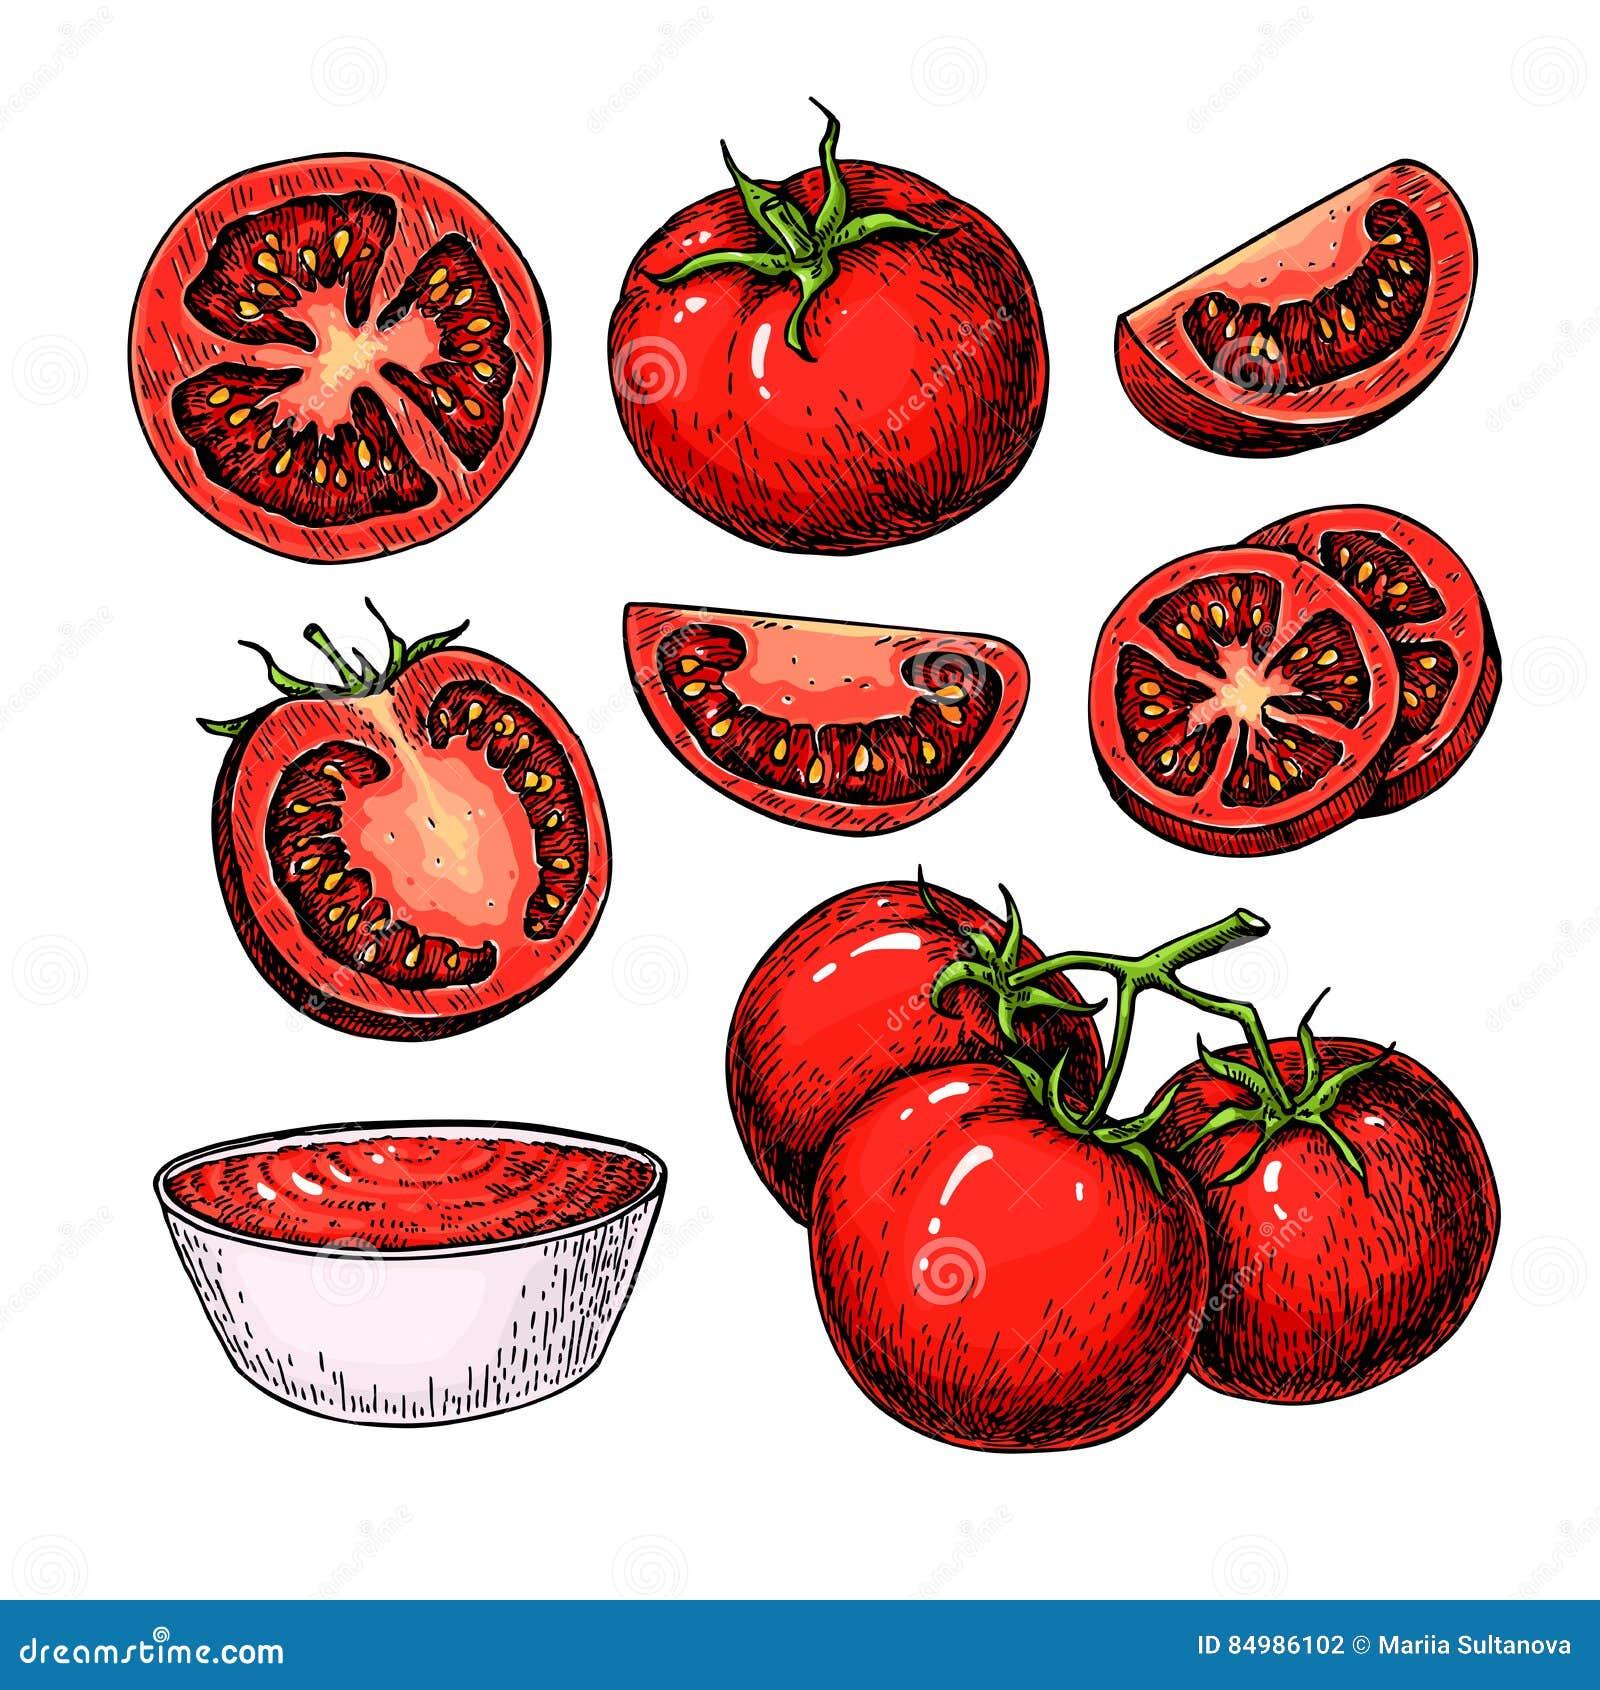 De dessin tomate stock illustrations vecteurs clipart 17 862 stock illustrations - Tomate dessin ...